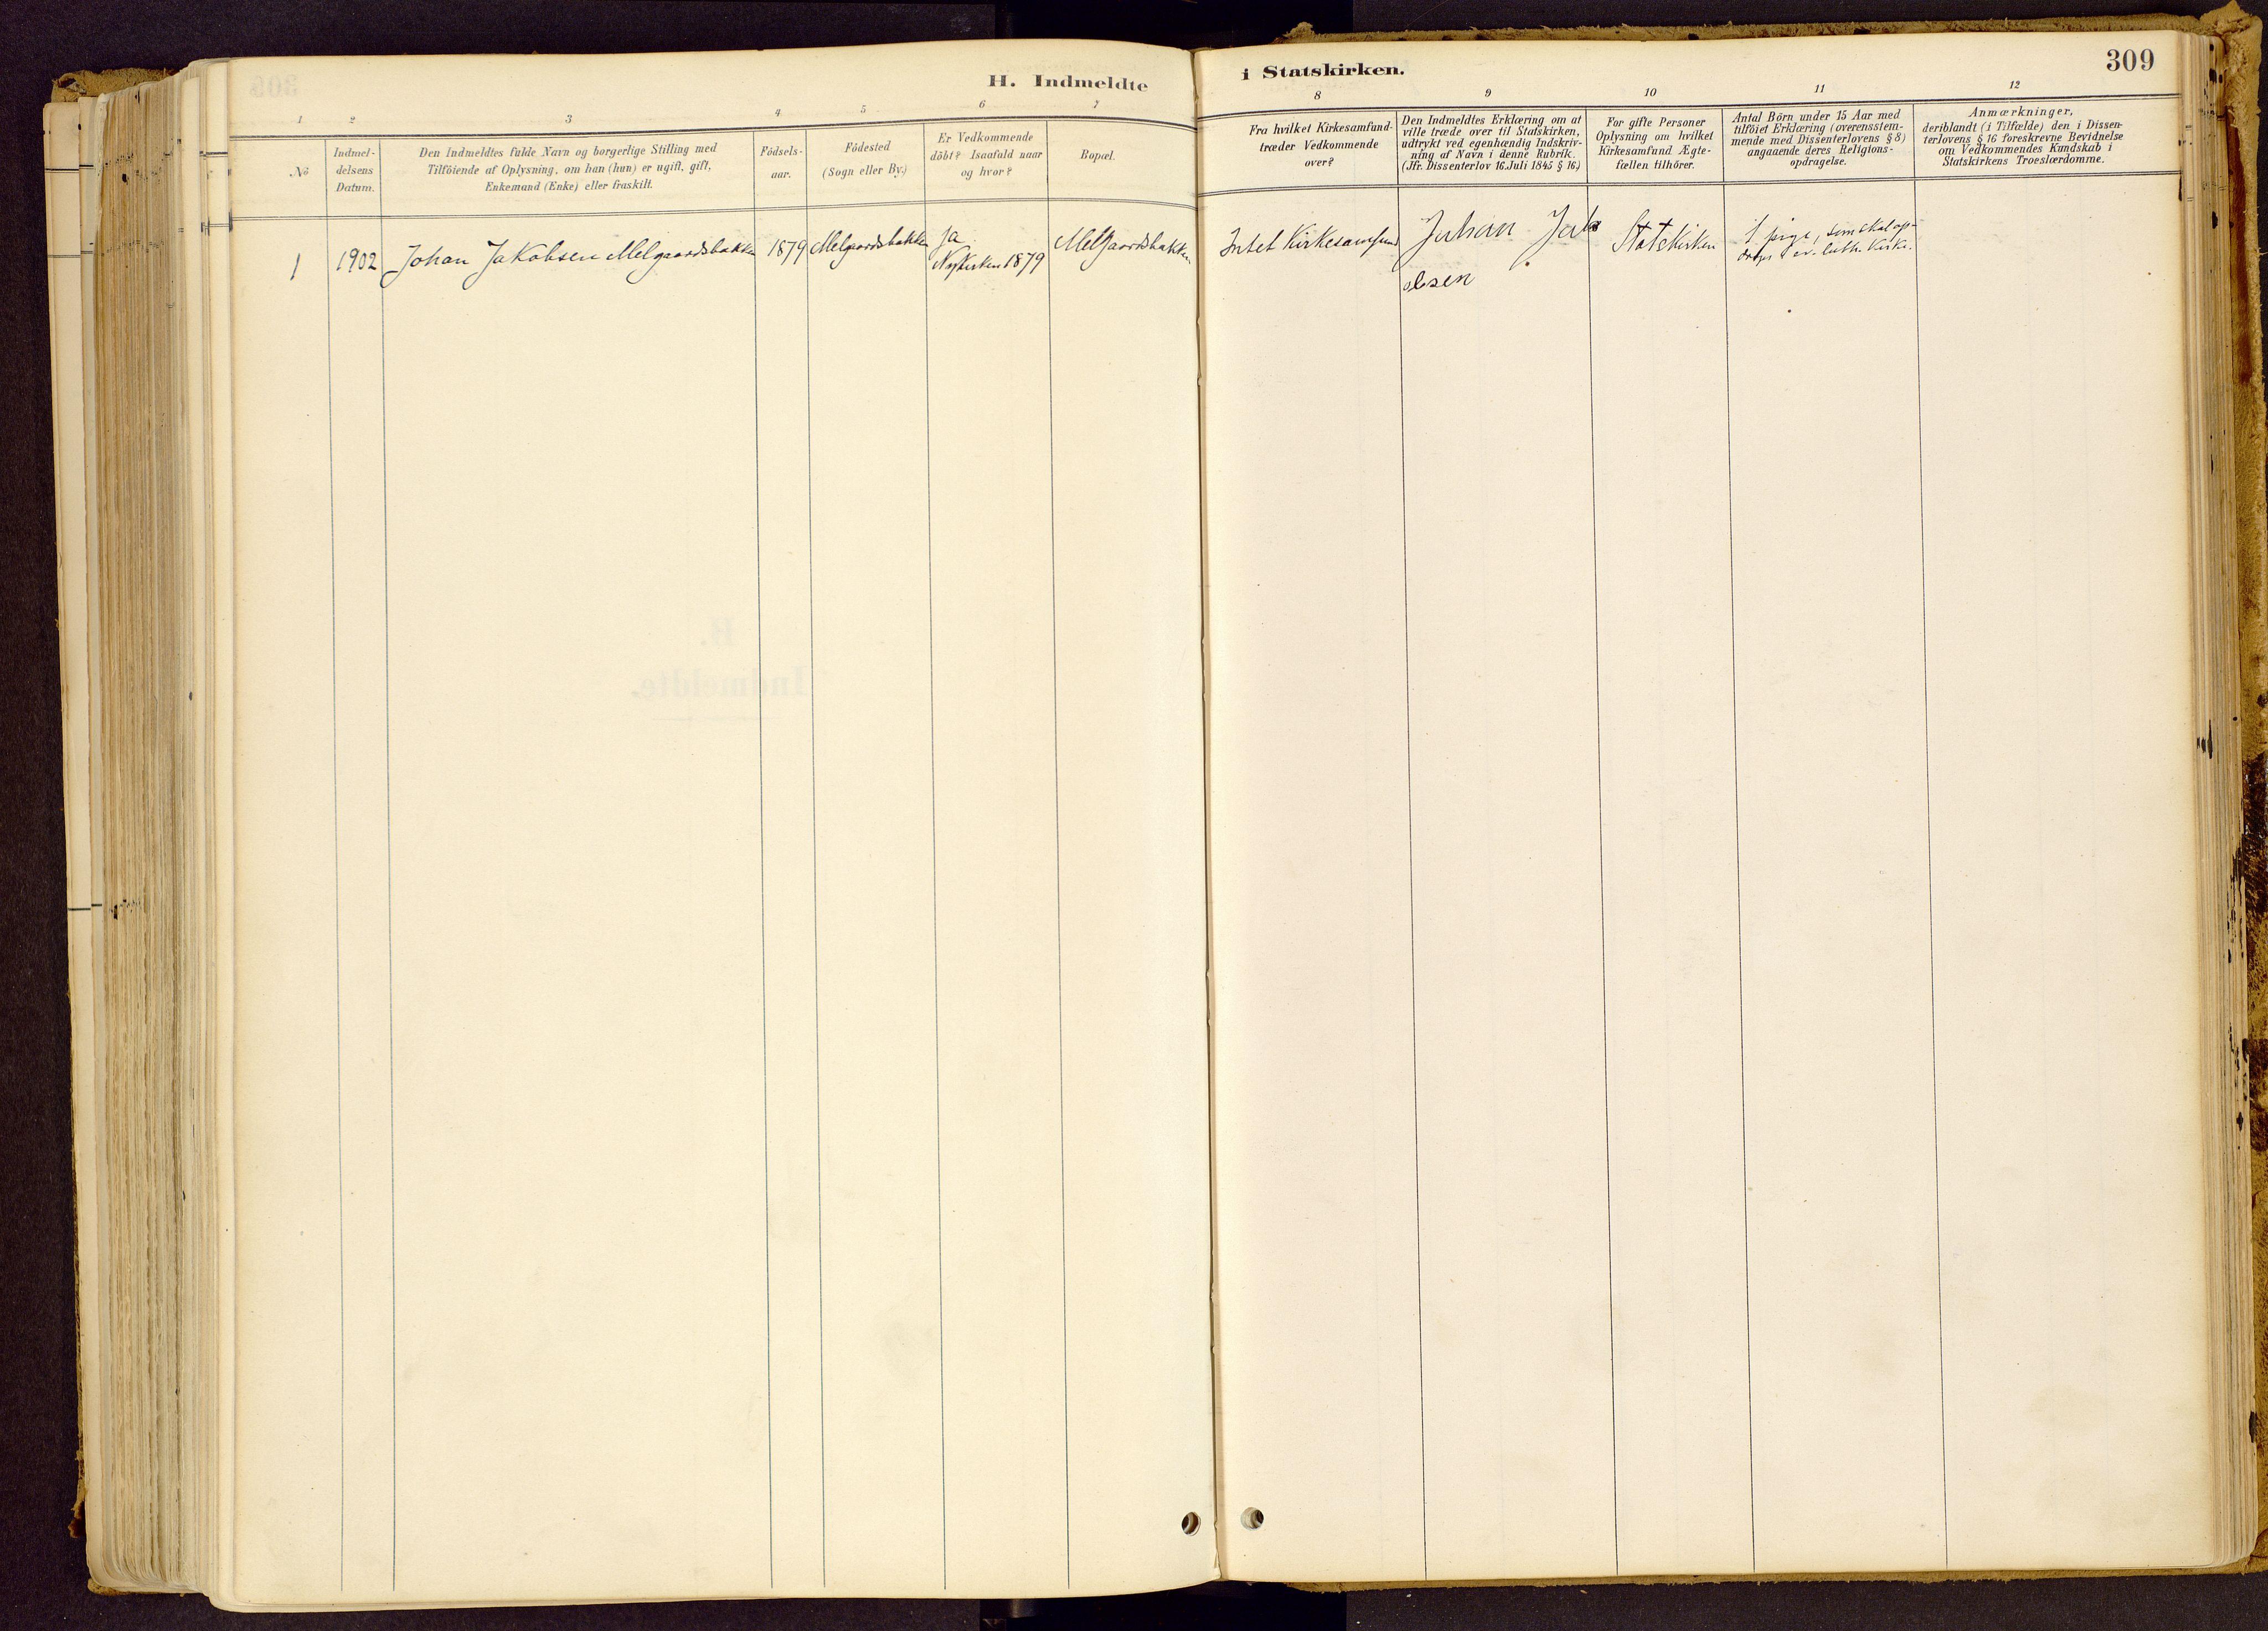 SAH, Vestre Gausdal prestekontor, Ministerialbok nr. 1, 1887-1914, s. 309